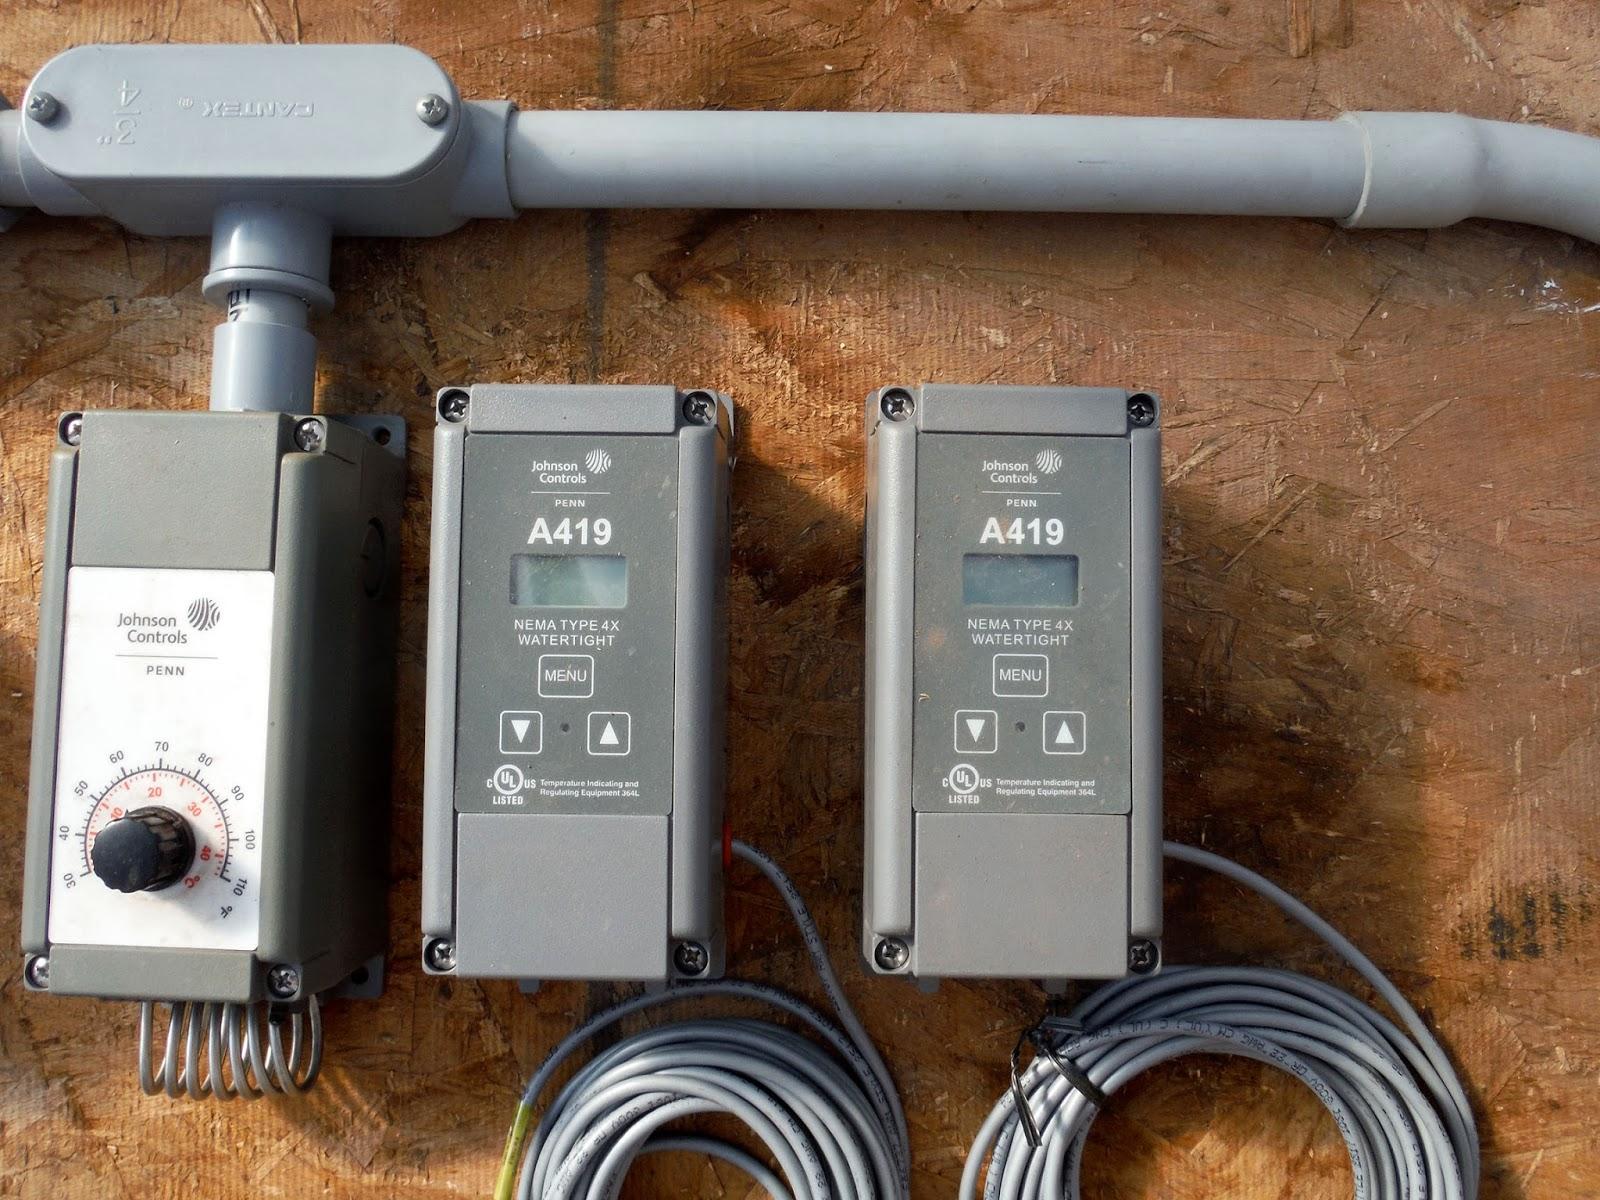 DSCF9766 durango urban agriculture aquaponics electrical 10 27 13